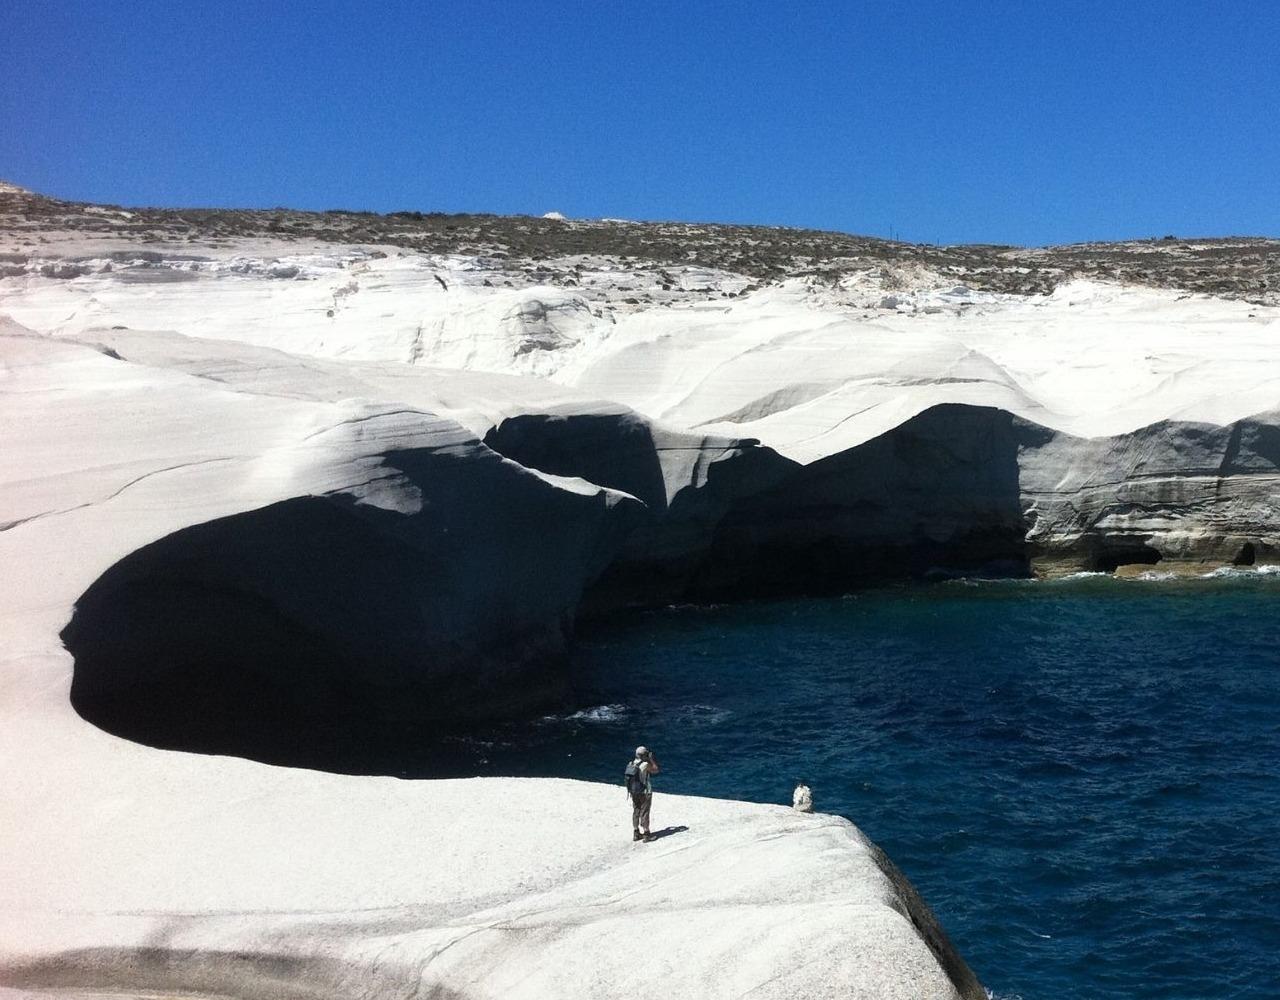 The Sarakiniko cliff, Milos, expertreiser © Wilfrid Valette-JPG